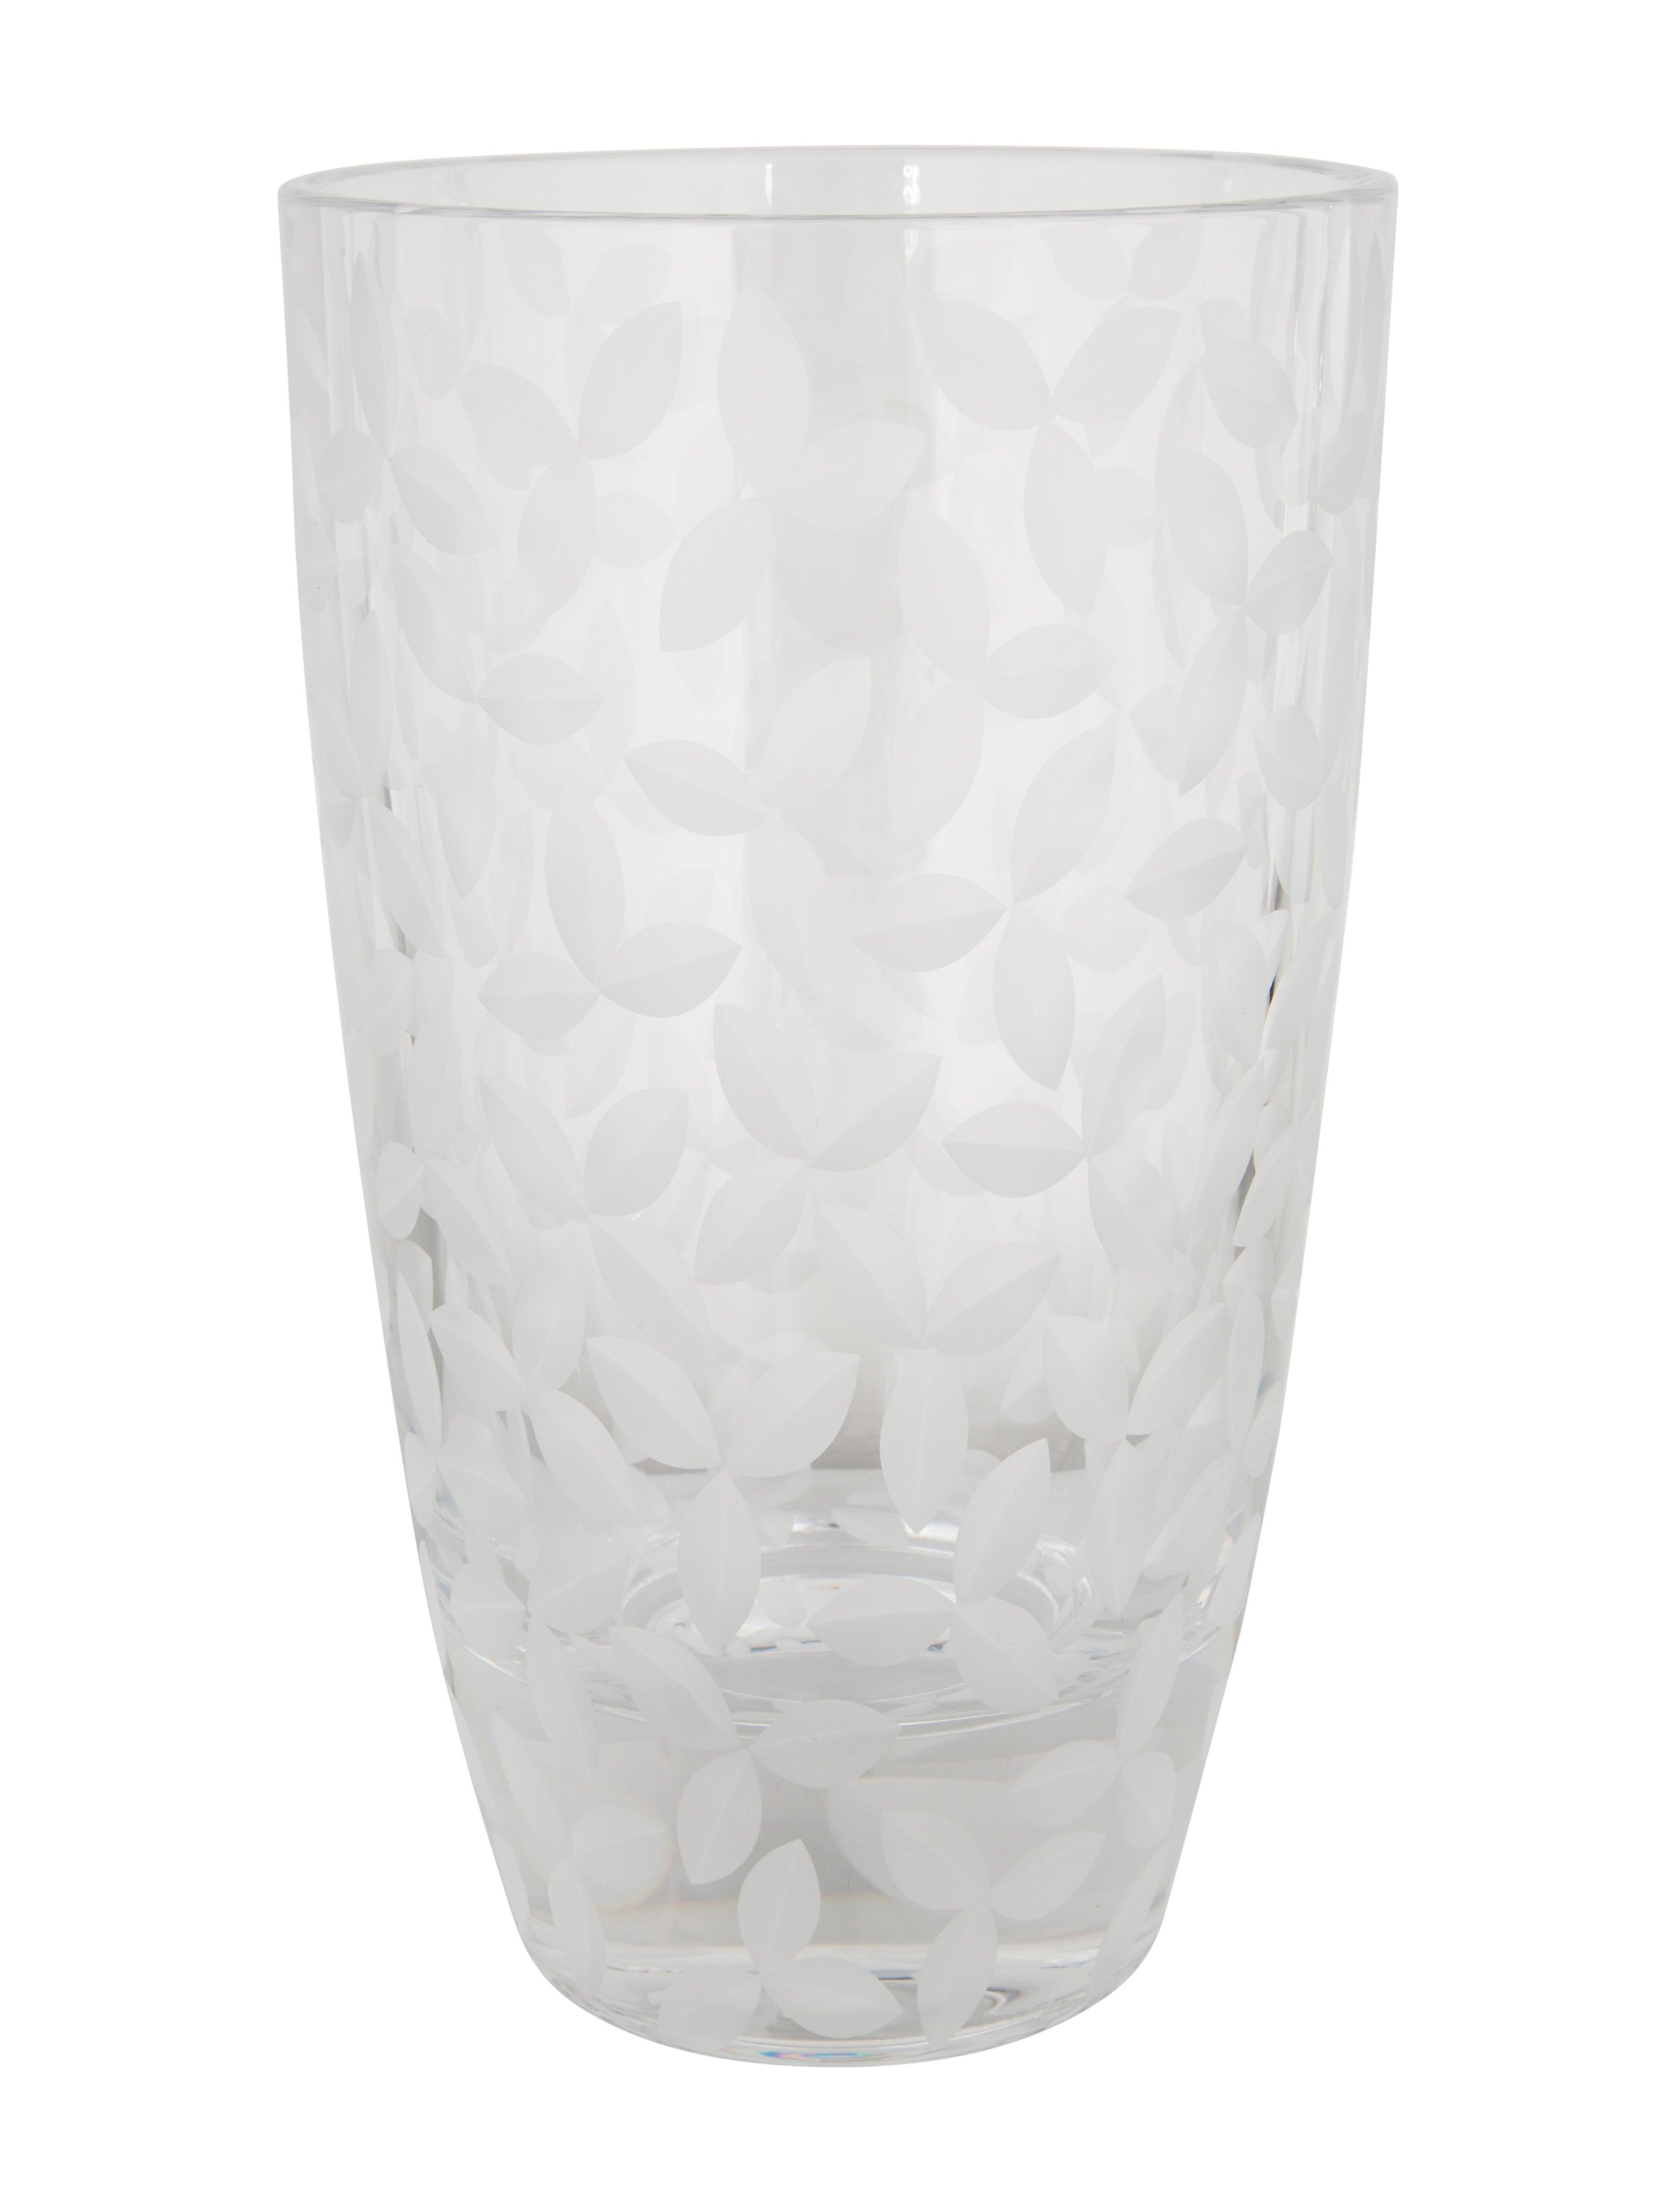 Tiffany co tiffany co frosted leaf vase decor and tiffany co frosted leaf vase reviewsmspy